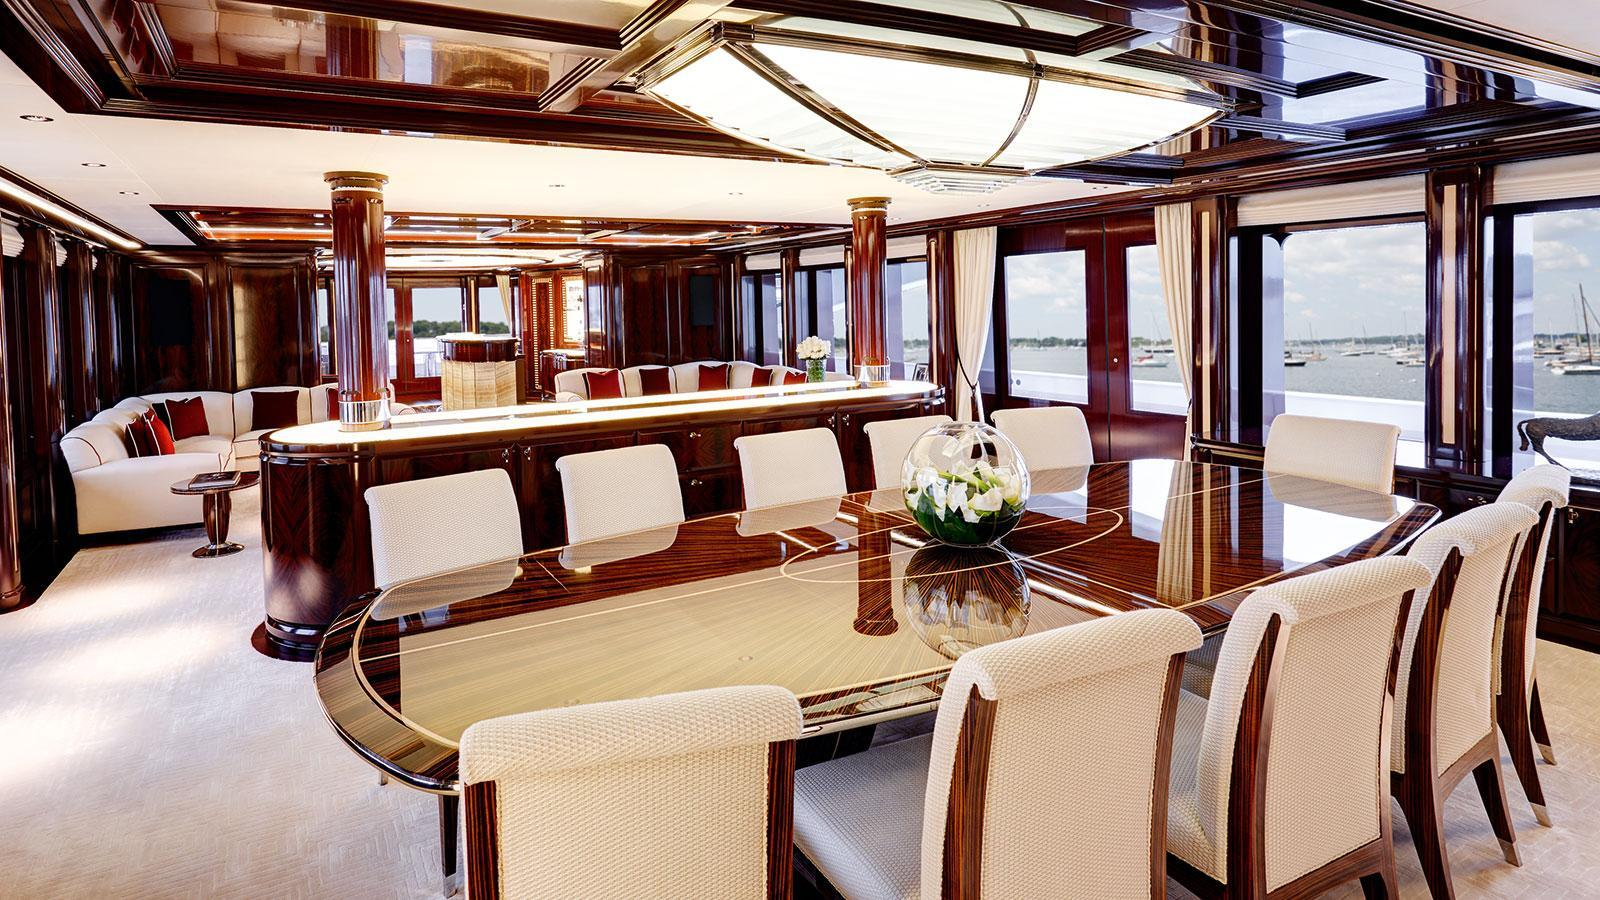 rock-it-motor-yacht-feadship-2014-60m-main-saloon-dining